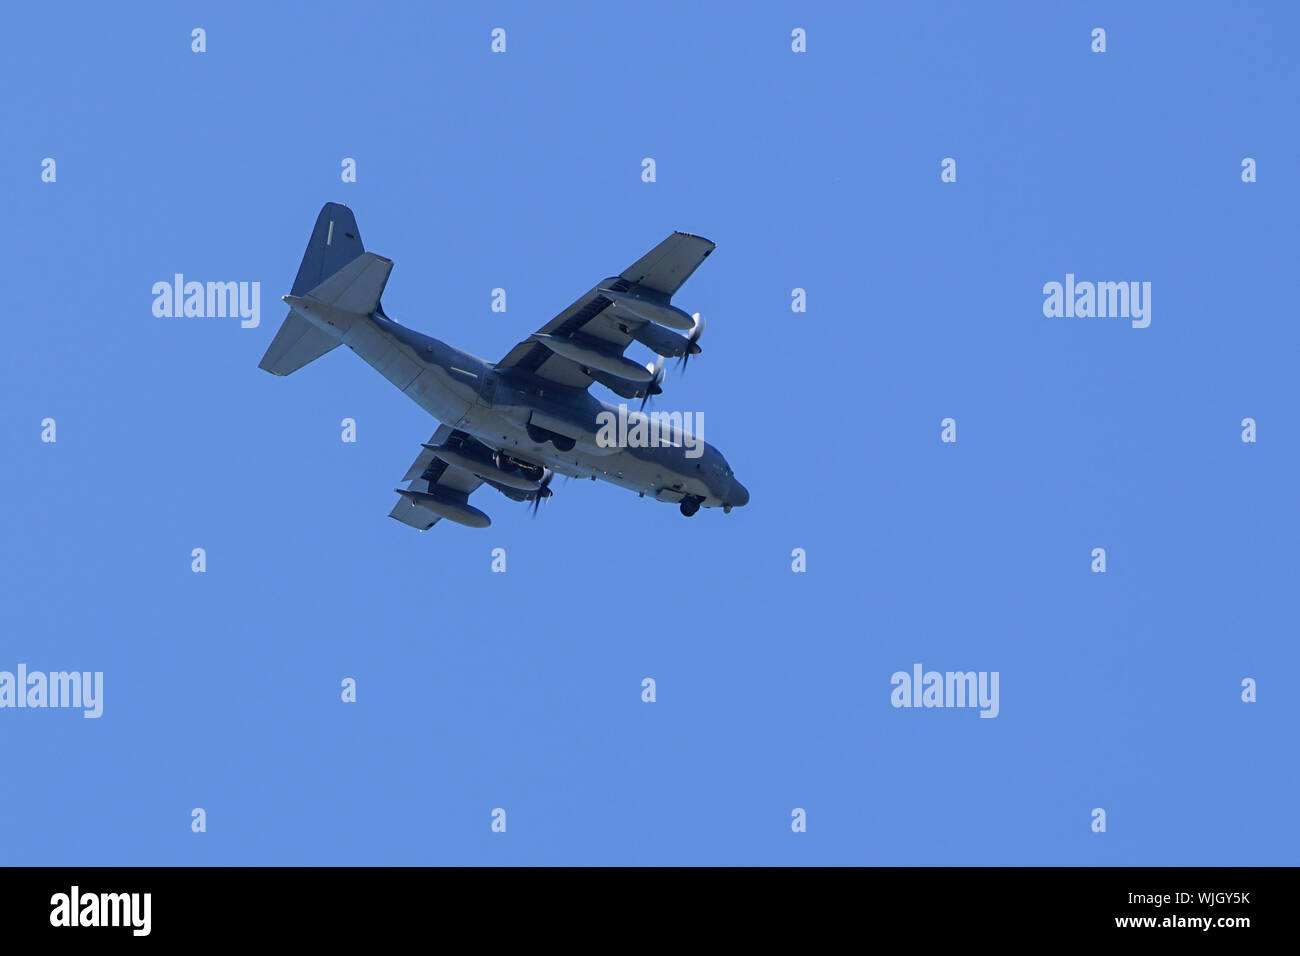 grey military transport plane fly on blue sky background - Stock Photo